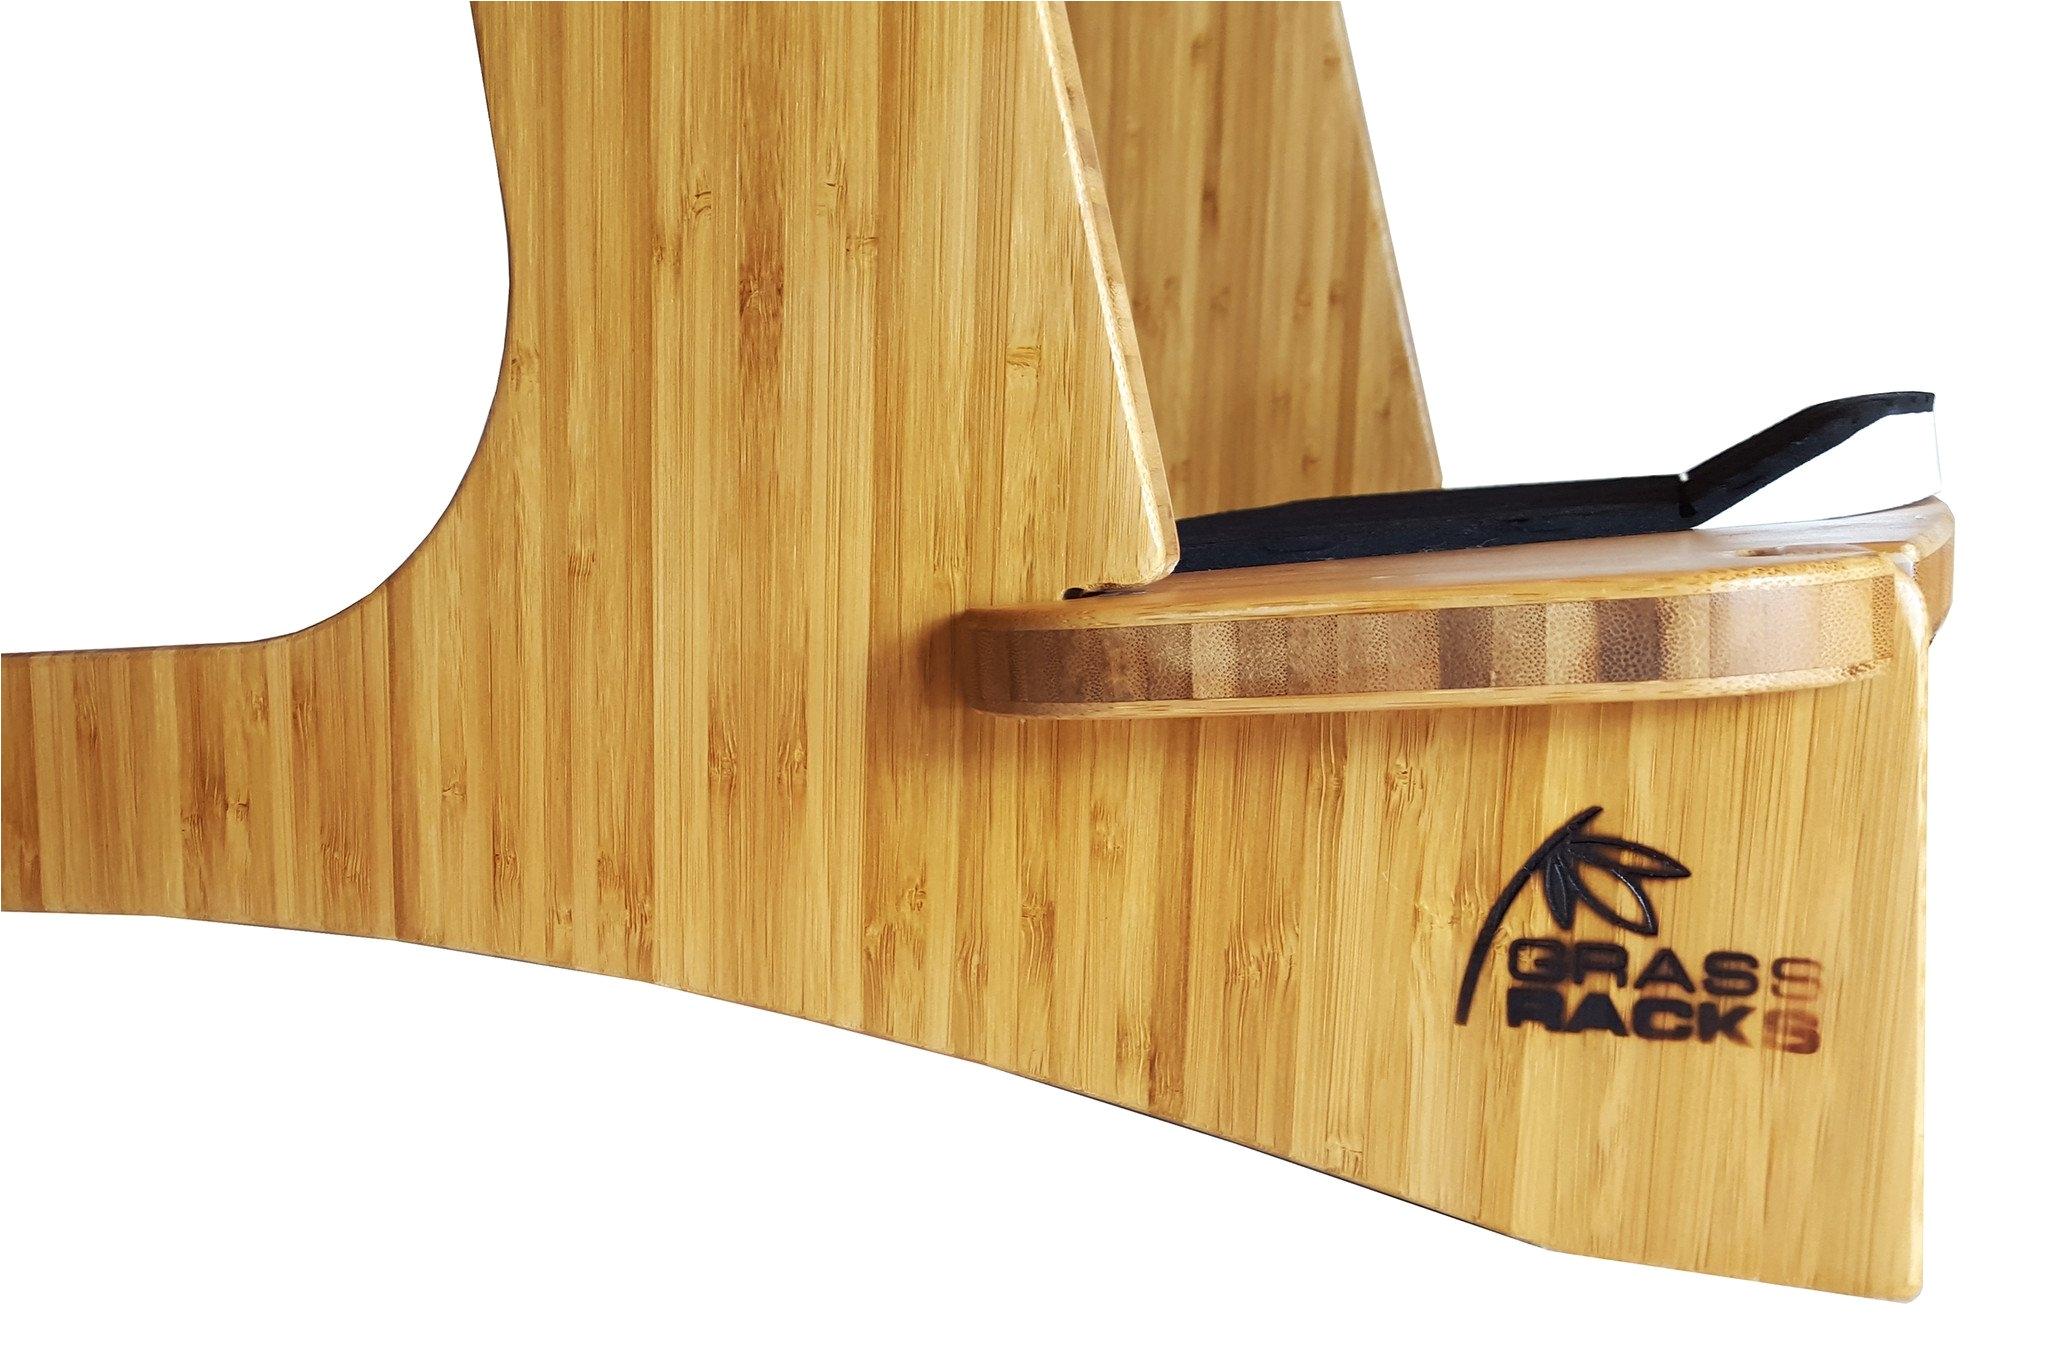 in store paddleboard surf rack by grassracks freestanding surfboard rack with kicker